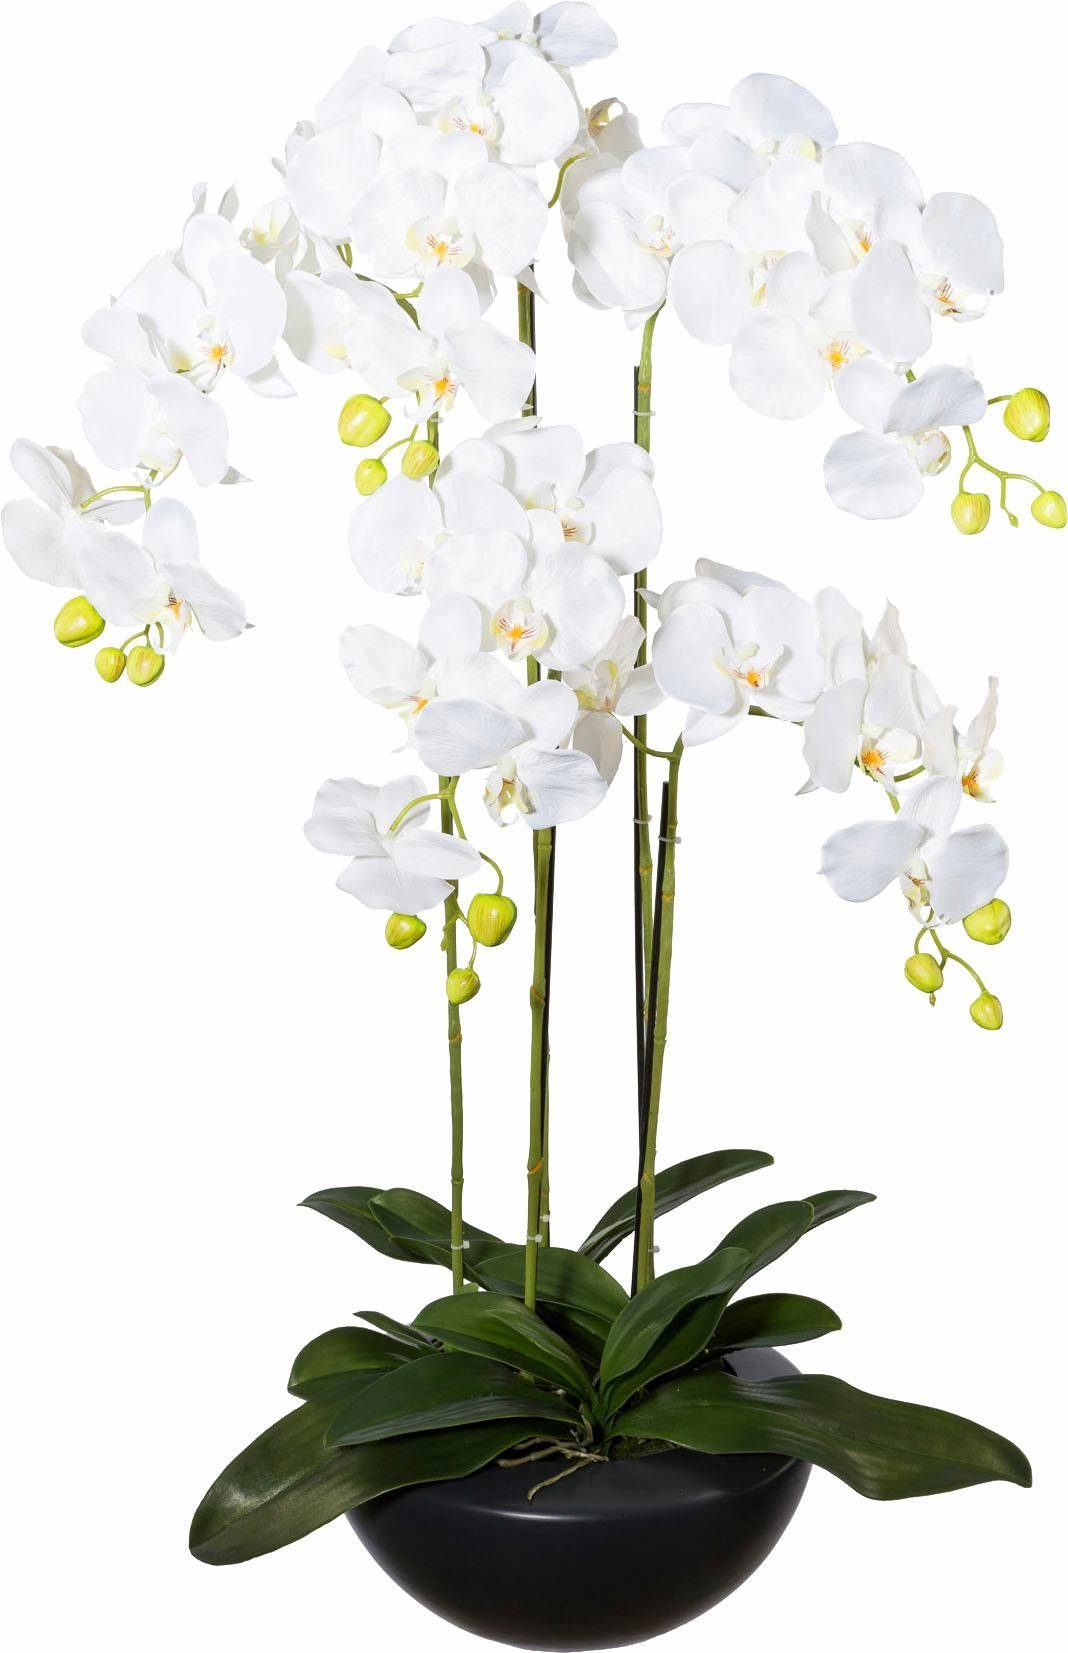 Deko Orchidee im Keramikschale